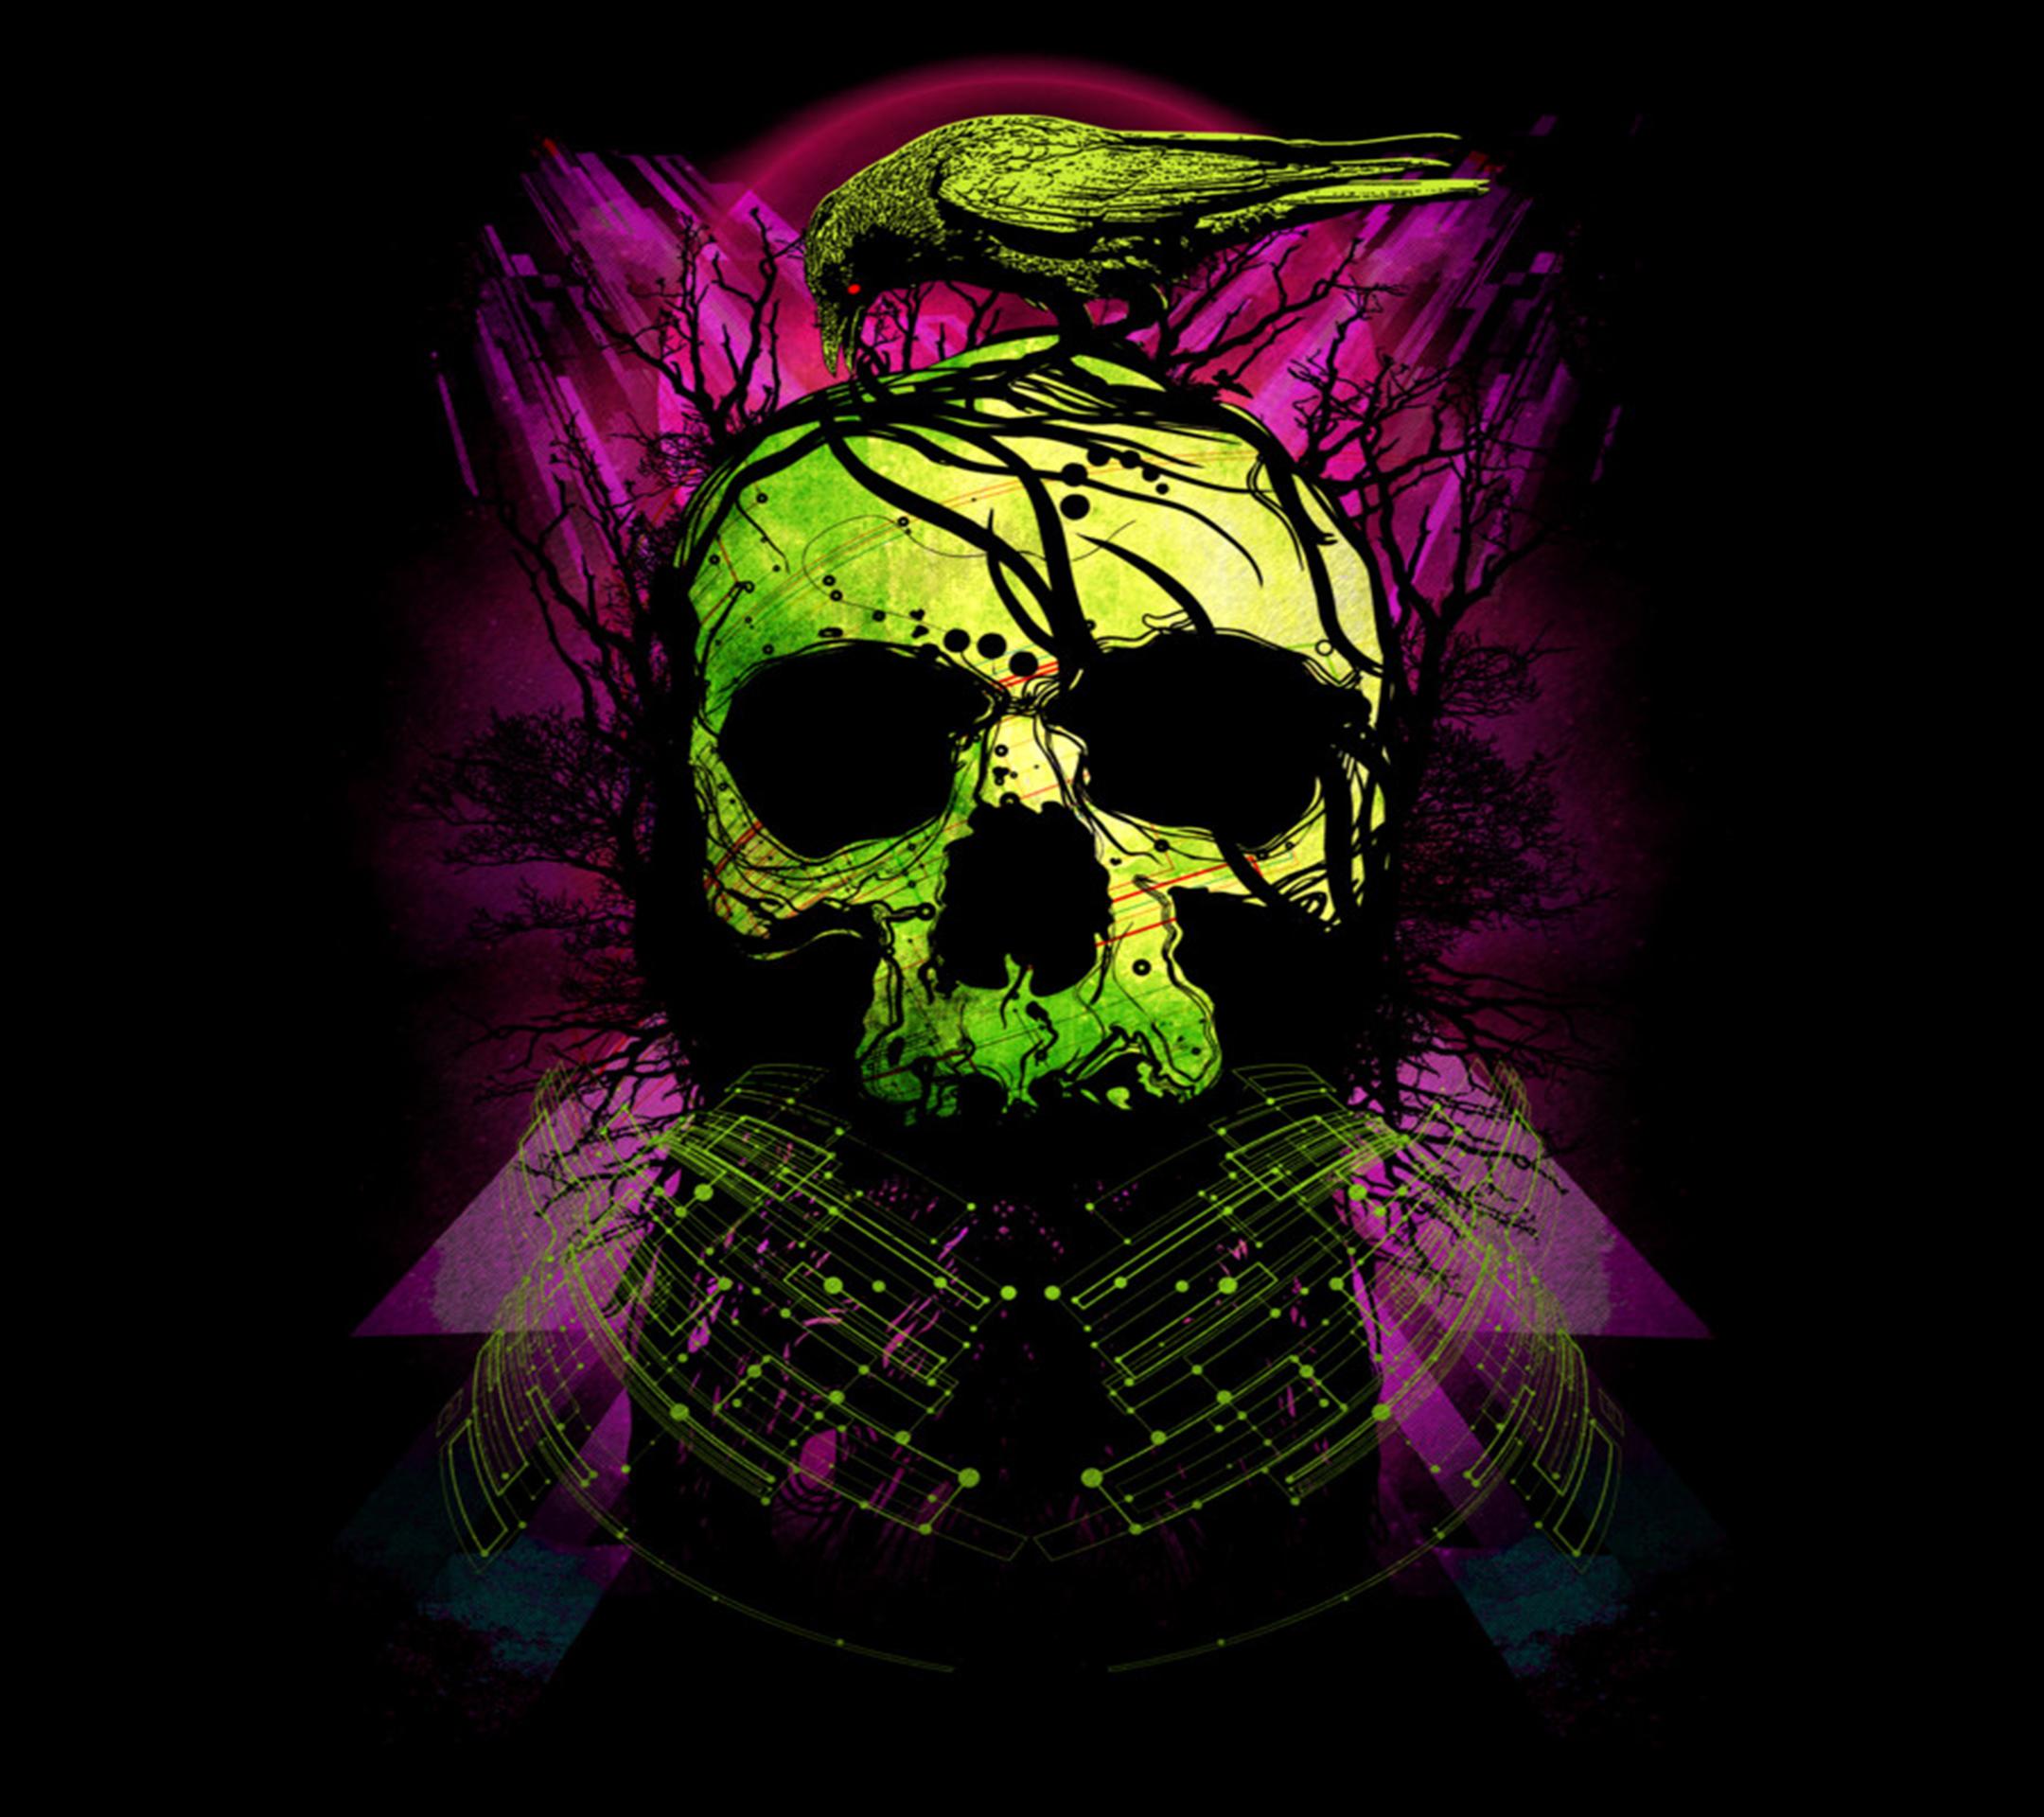 zombie skull wallpapers for desktop - photo #20